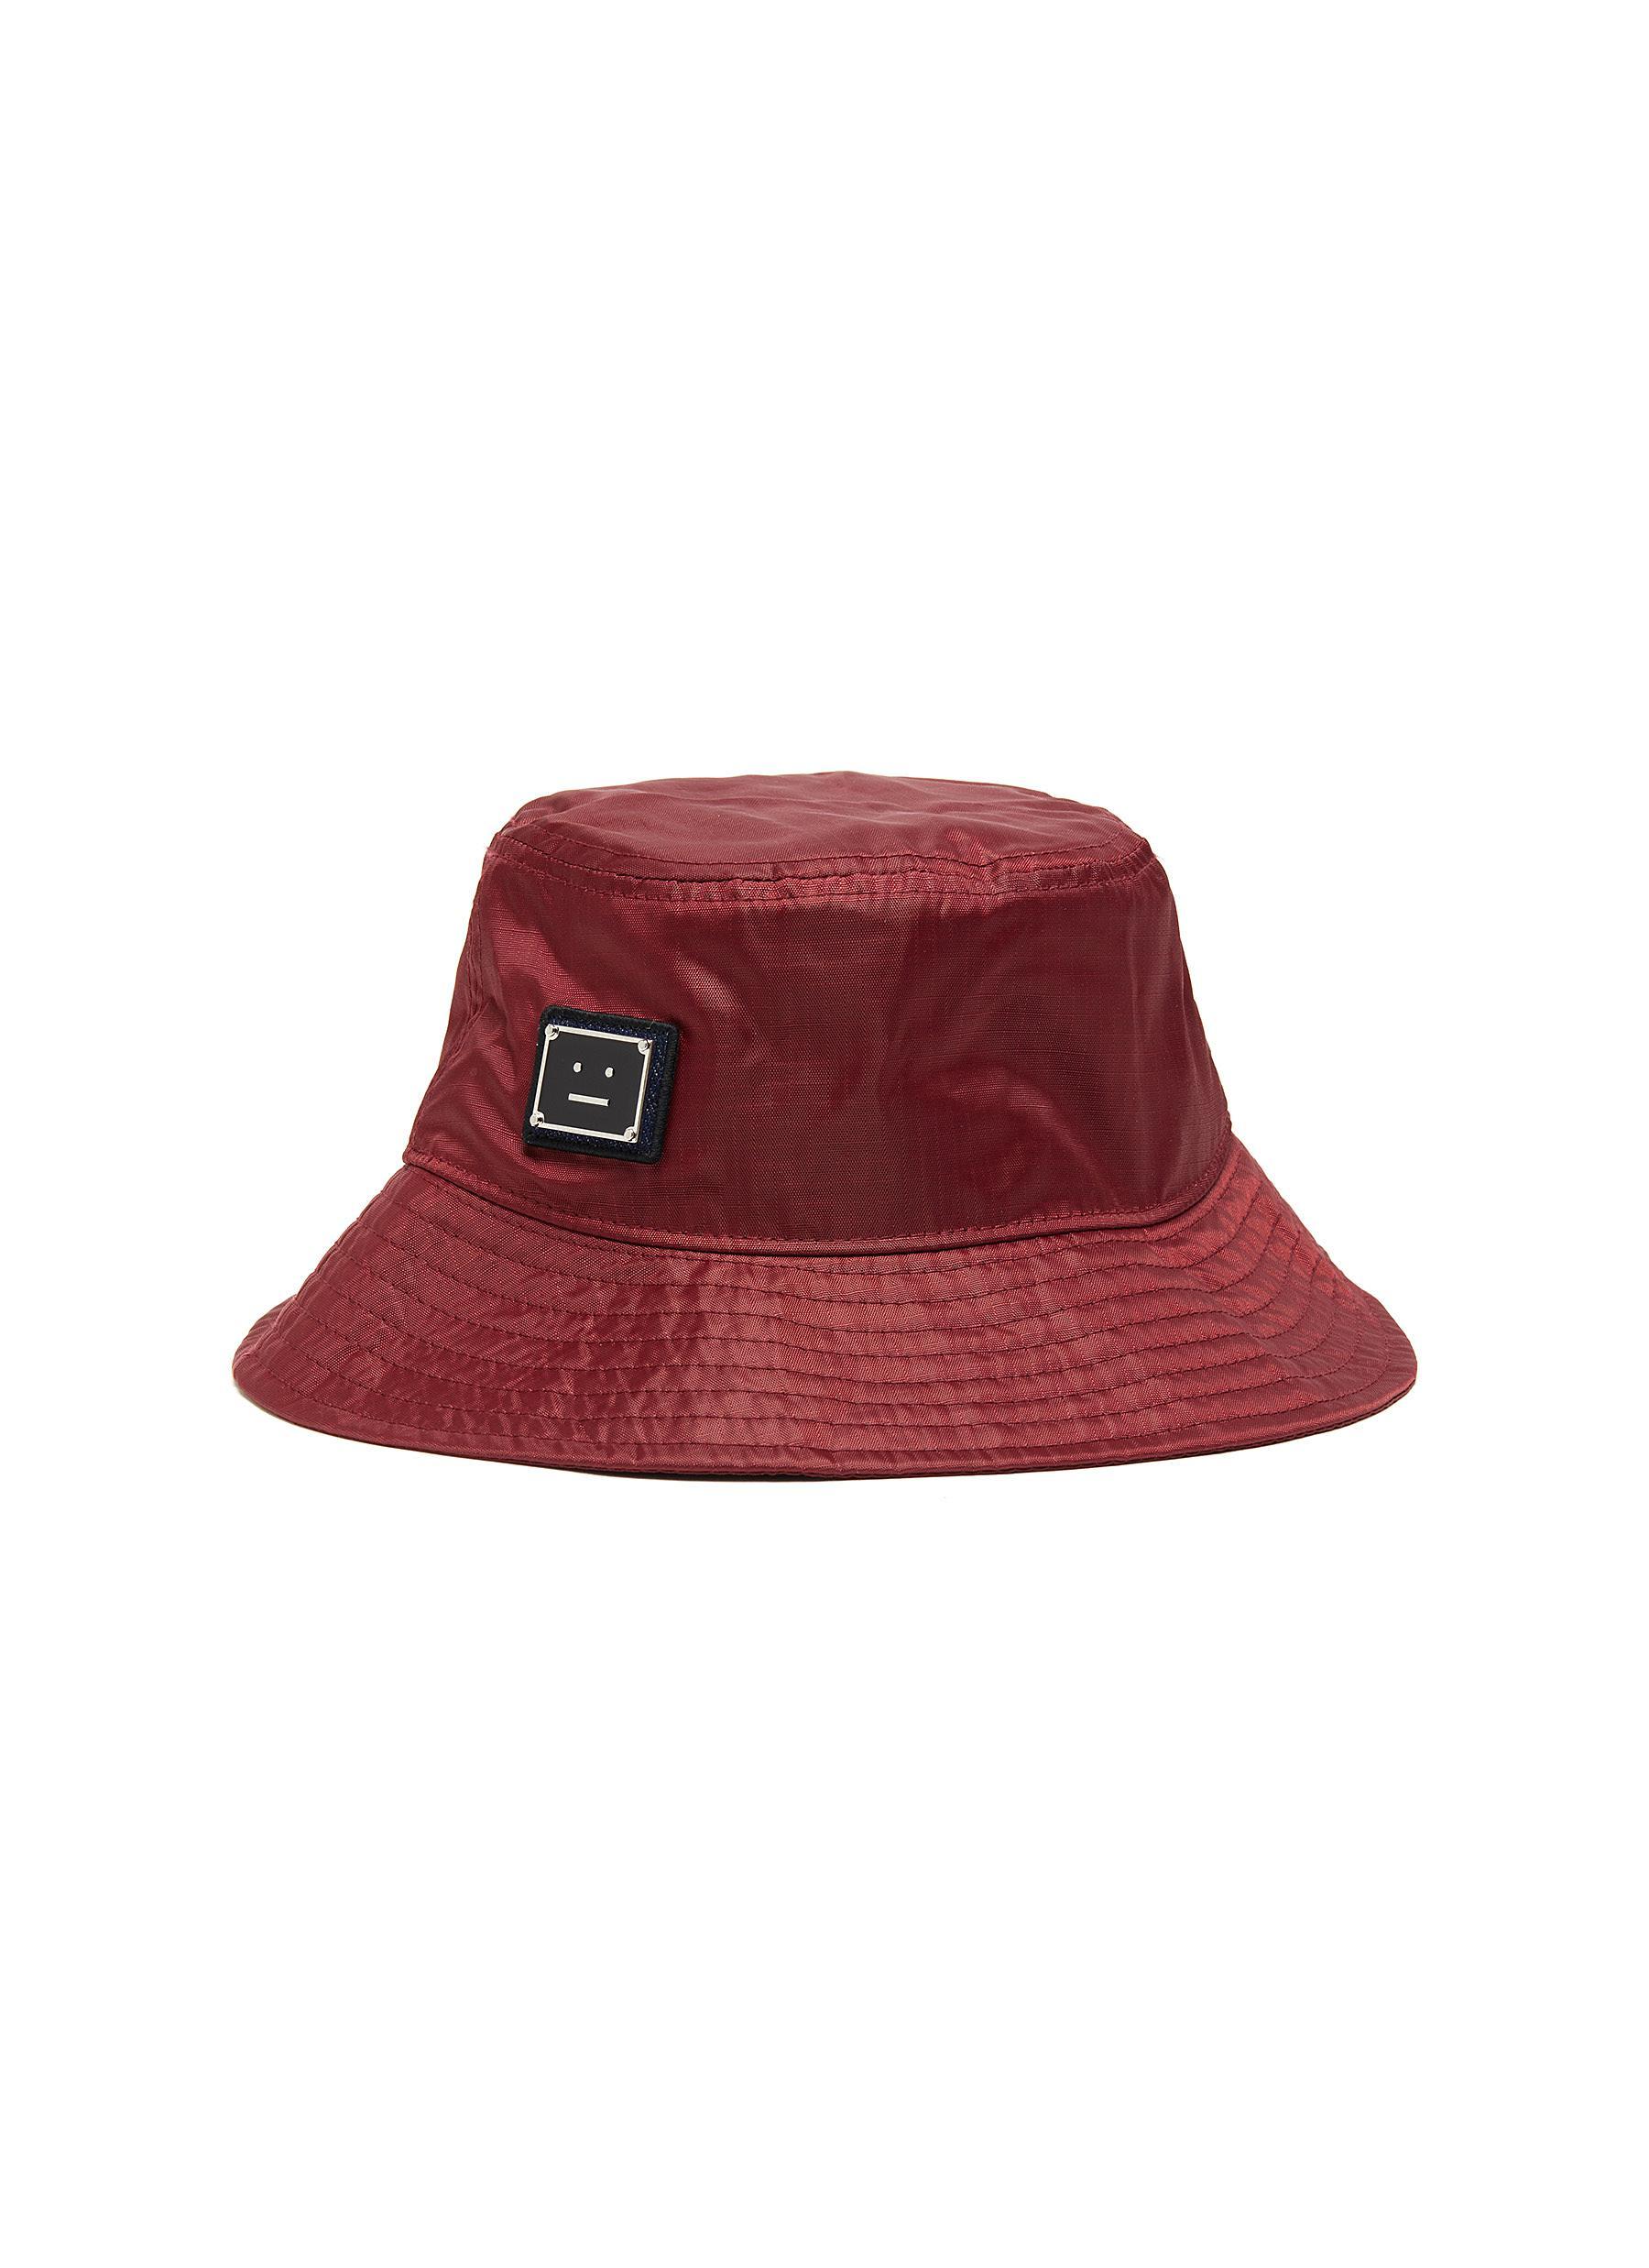 Acne Studios Accessories FACE PLAQUE NYLON BUCKET HAT